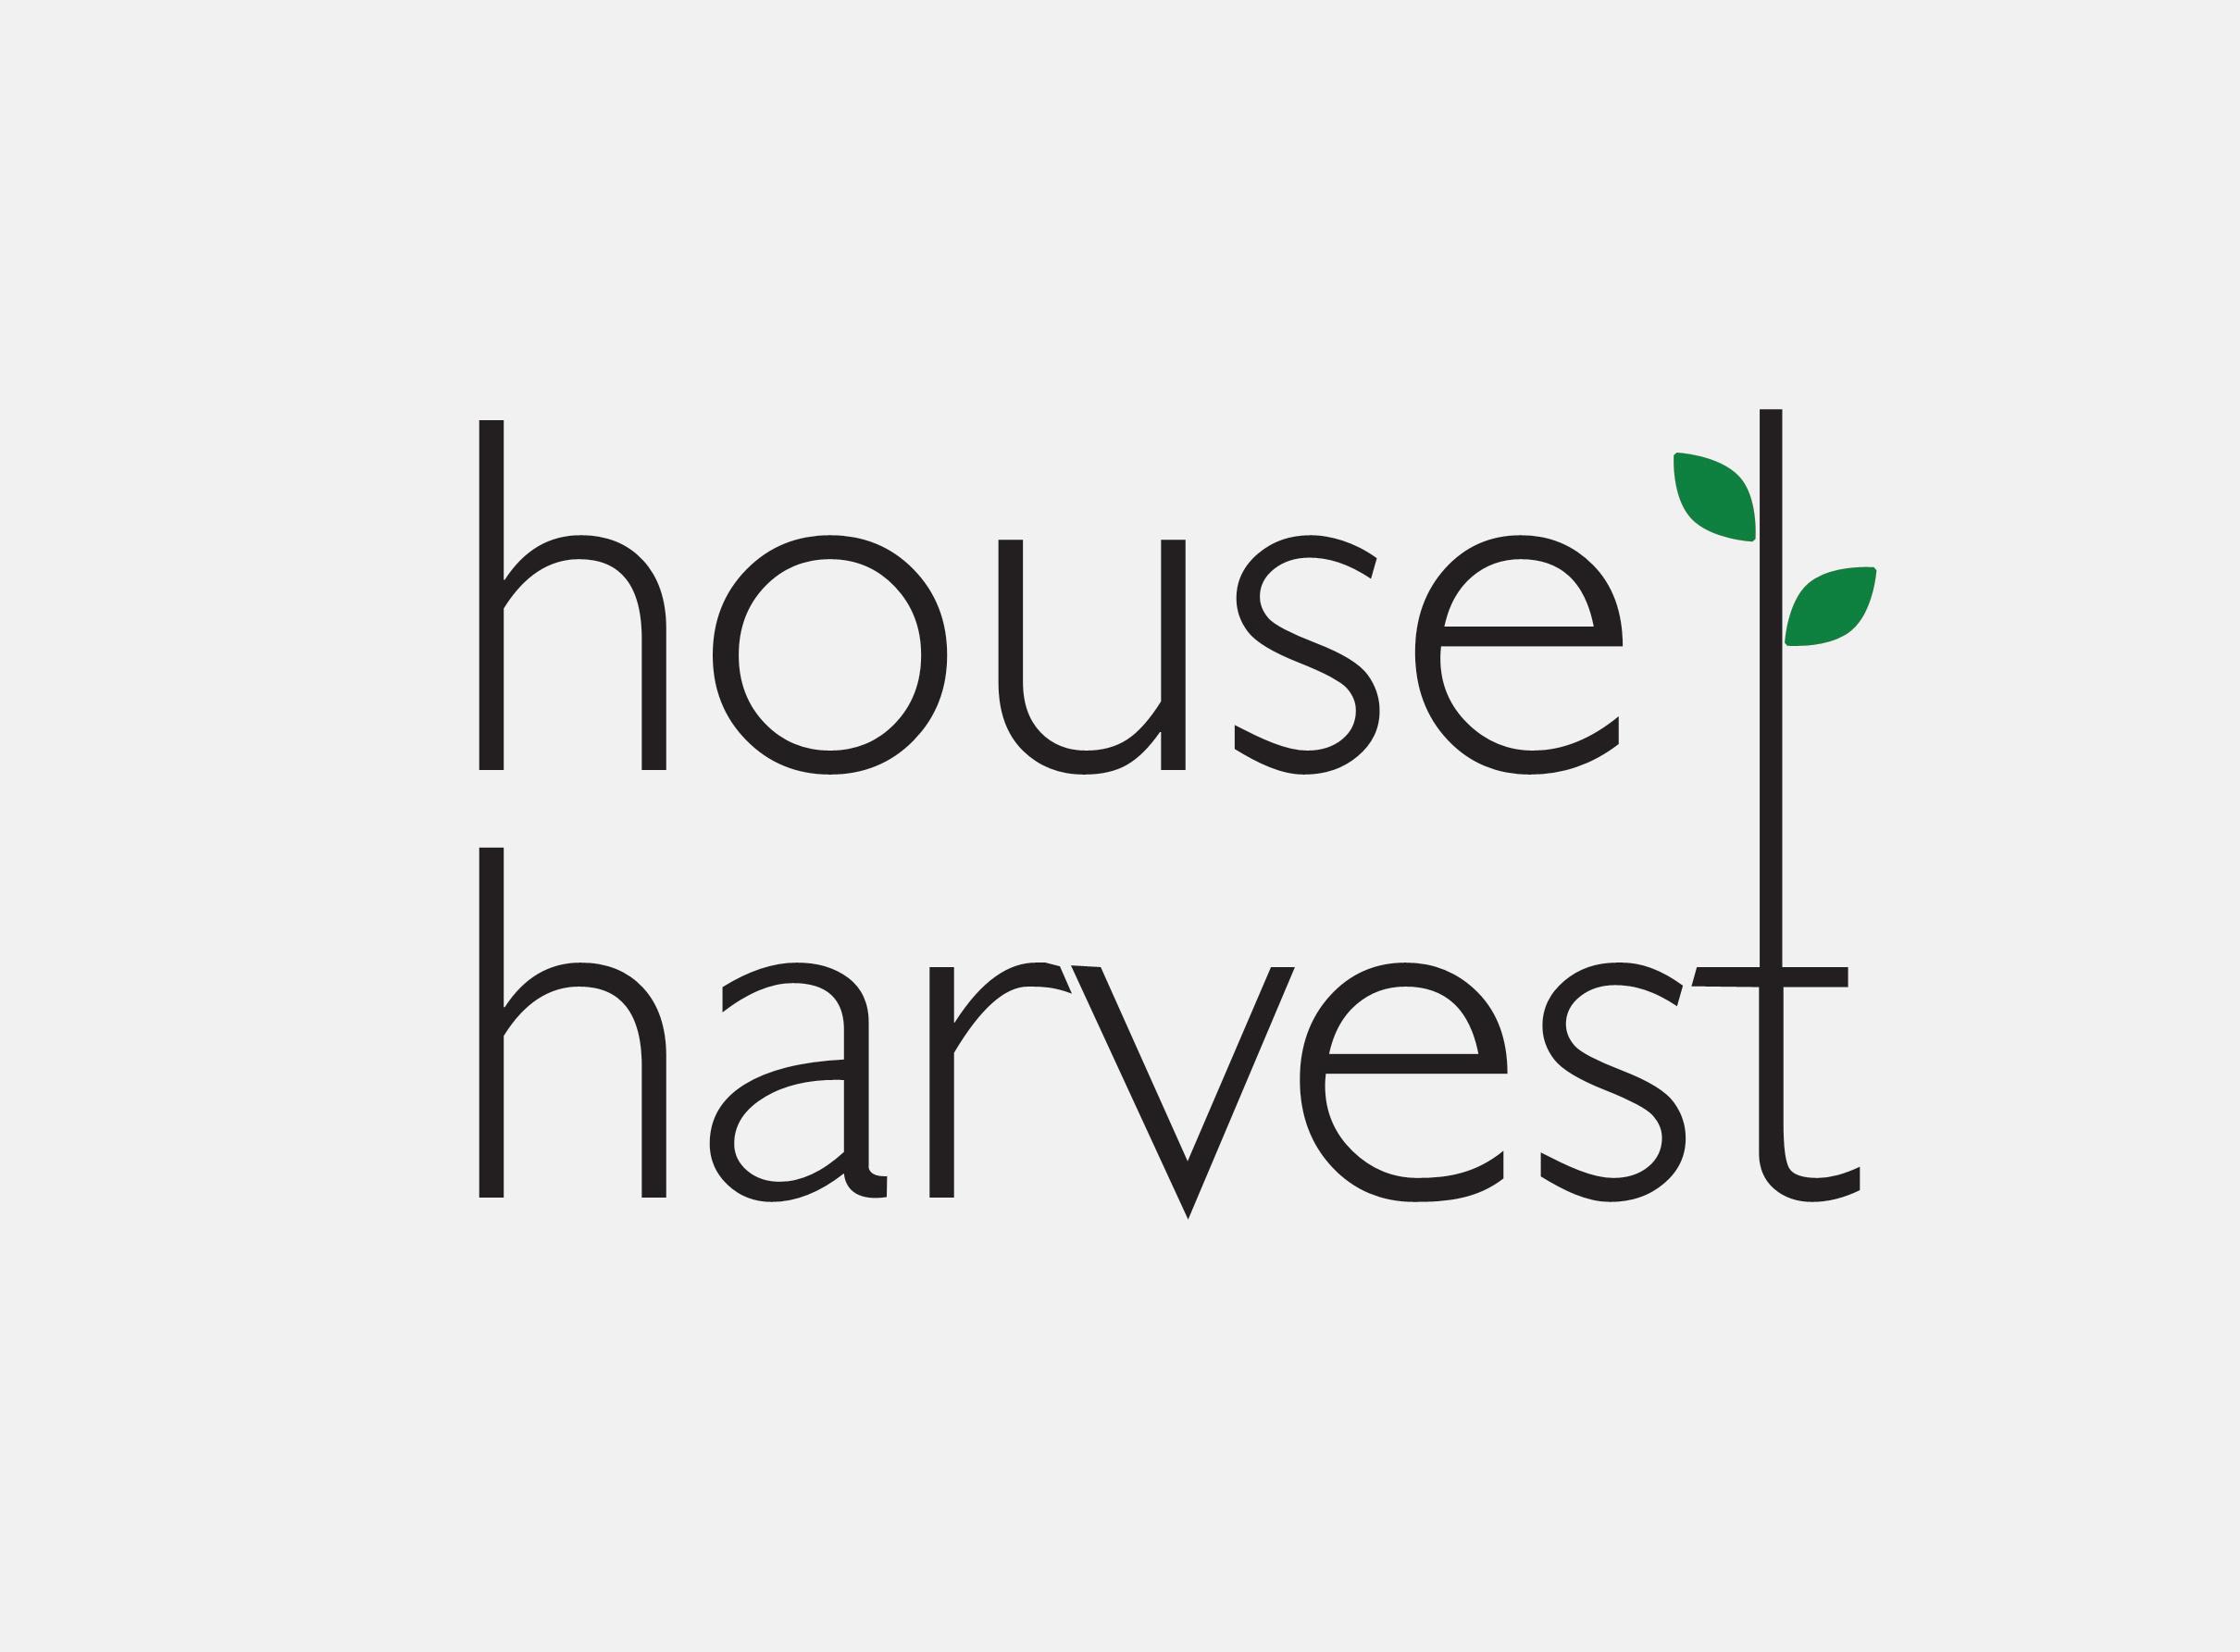 househarvest logo